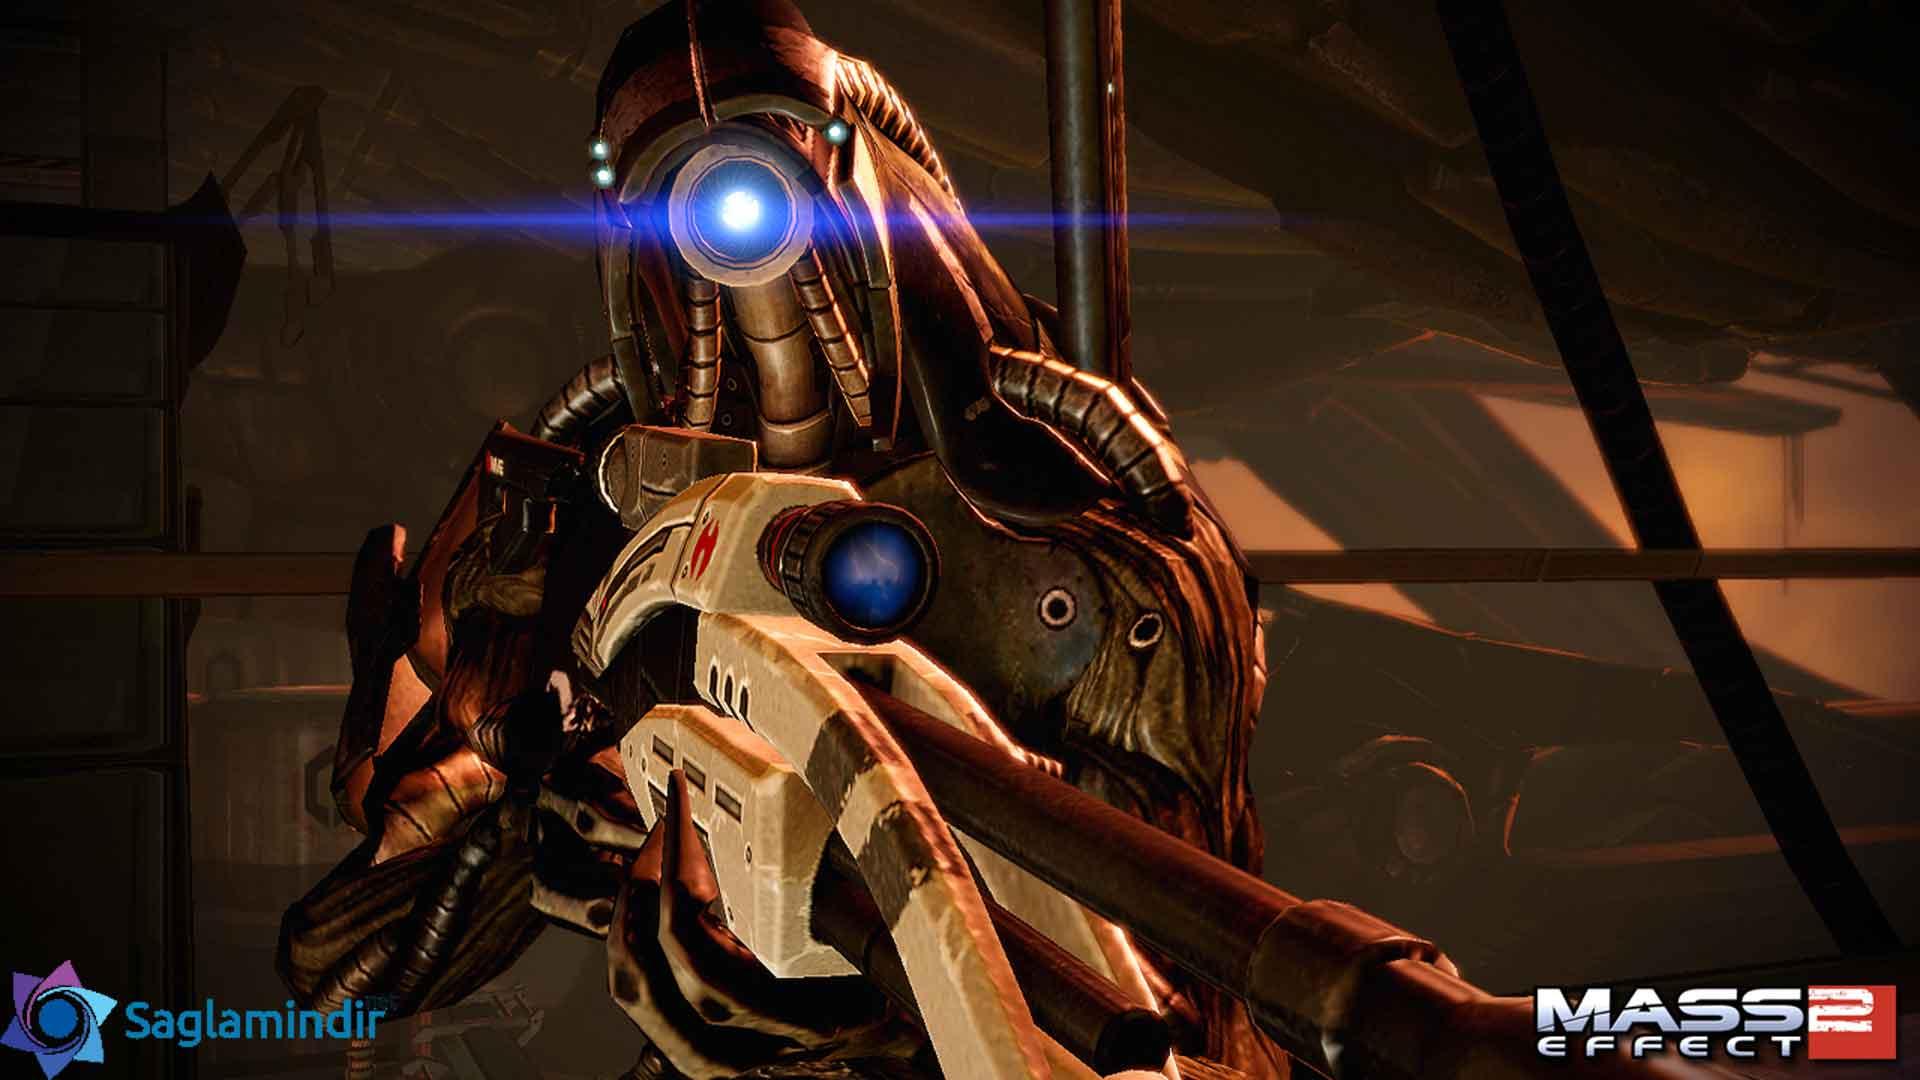 Mass-Effect-2-saglamindir